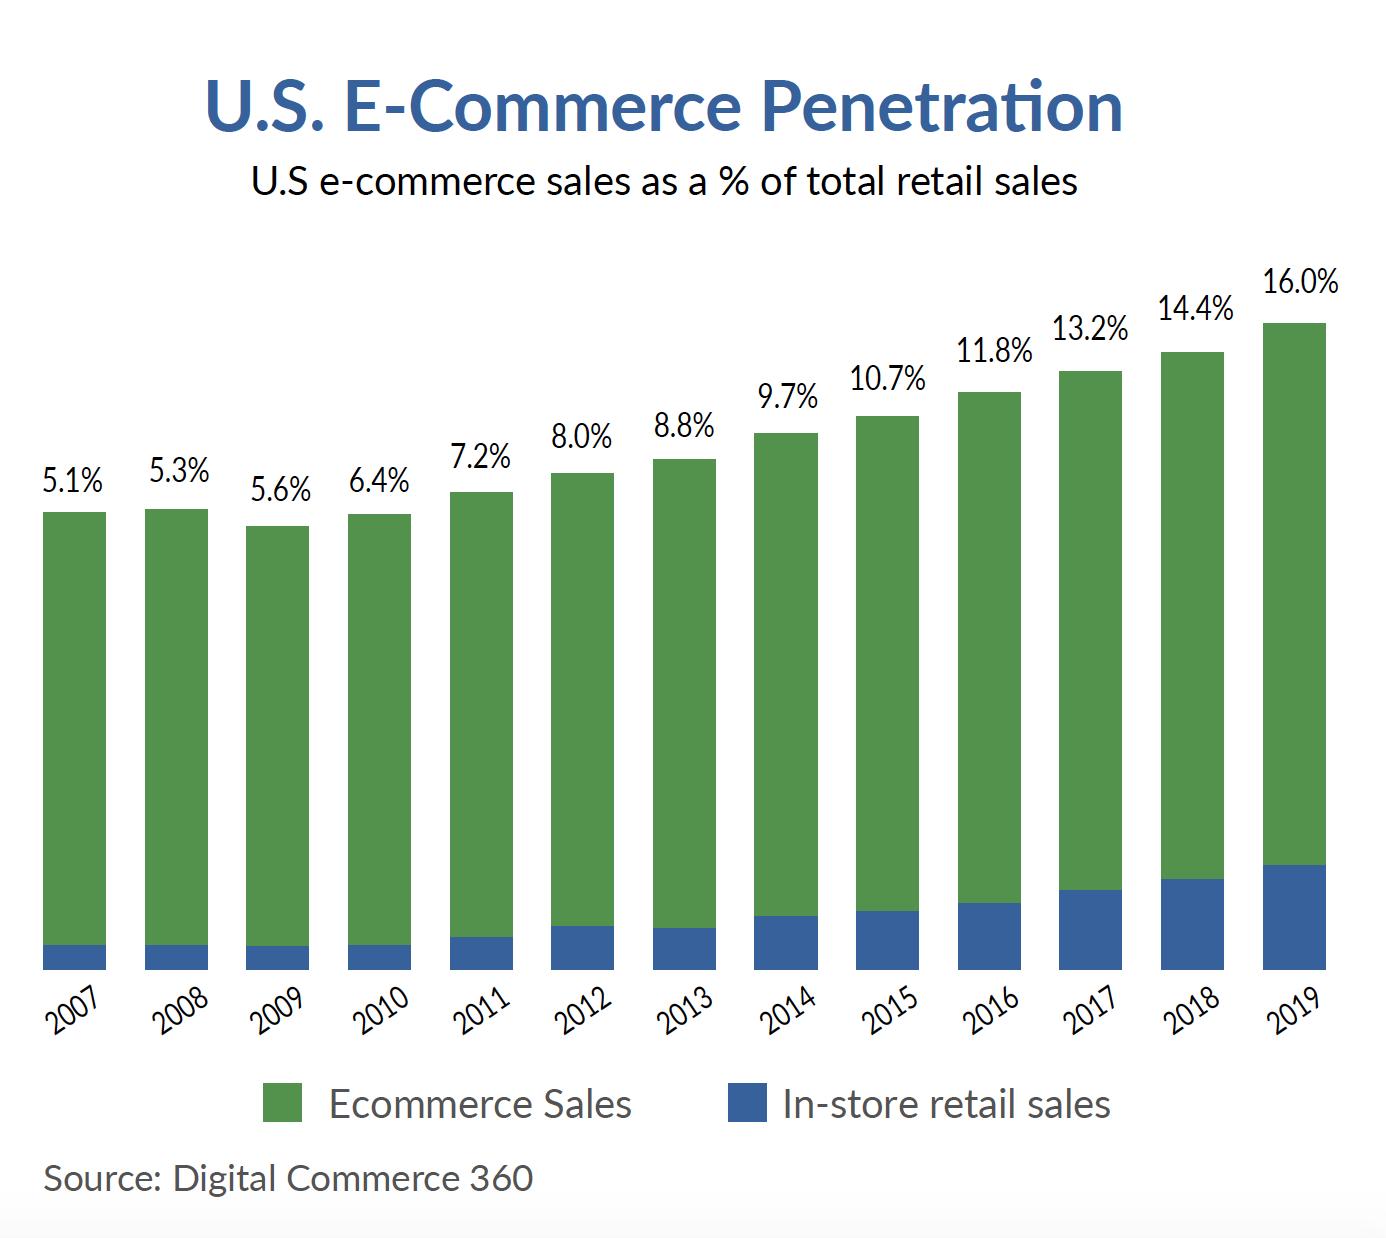 U.S. E-Commerce Penetration: U.S e-commerce sales as a % of total retail sales